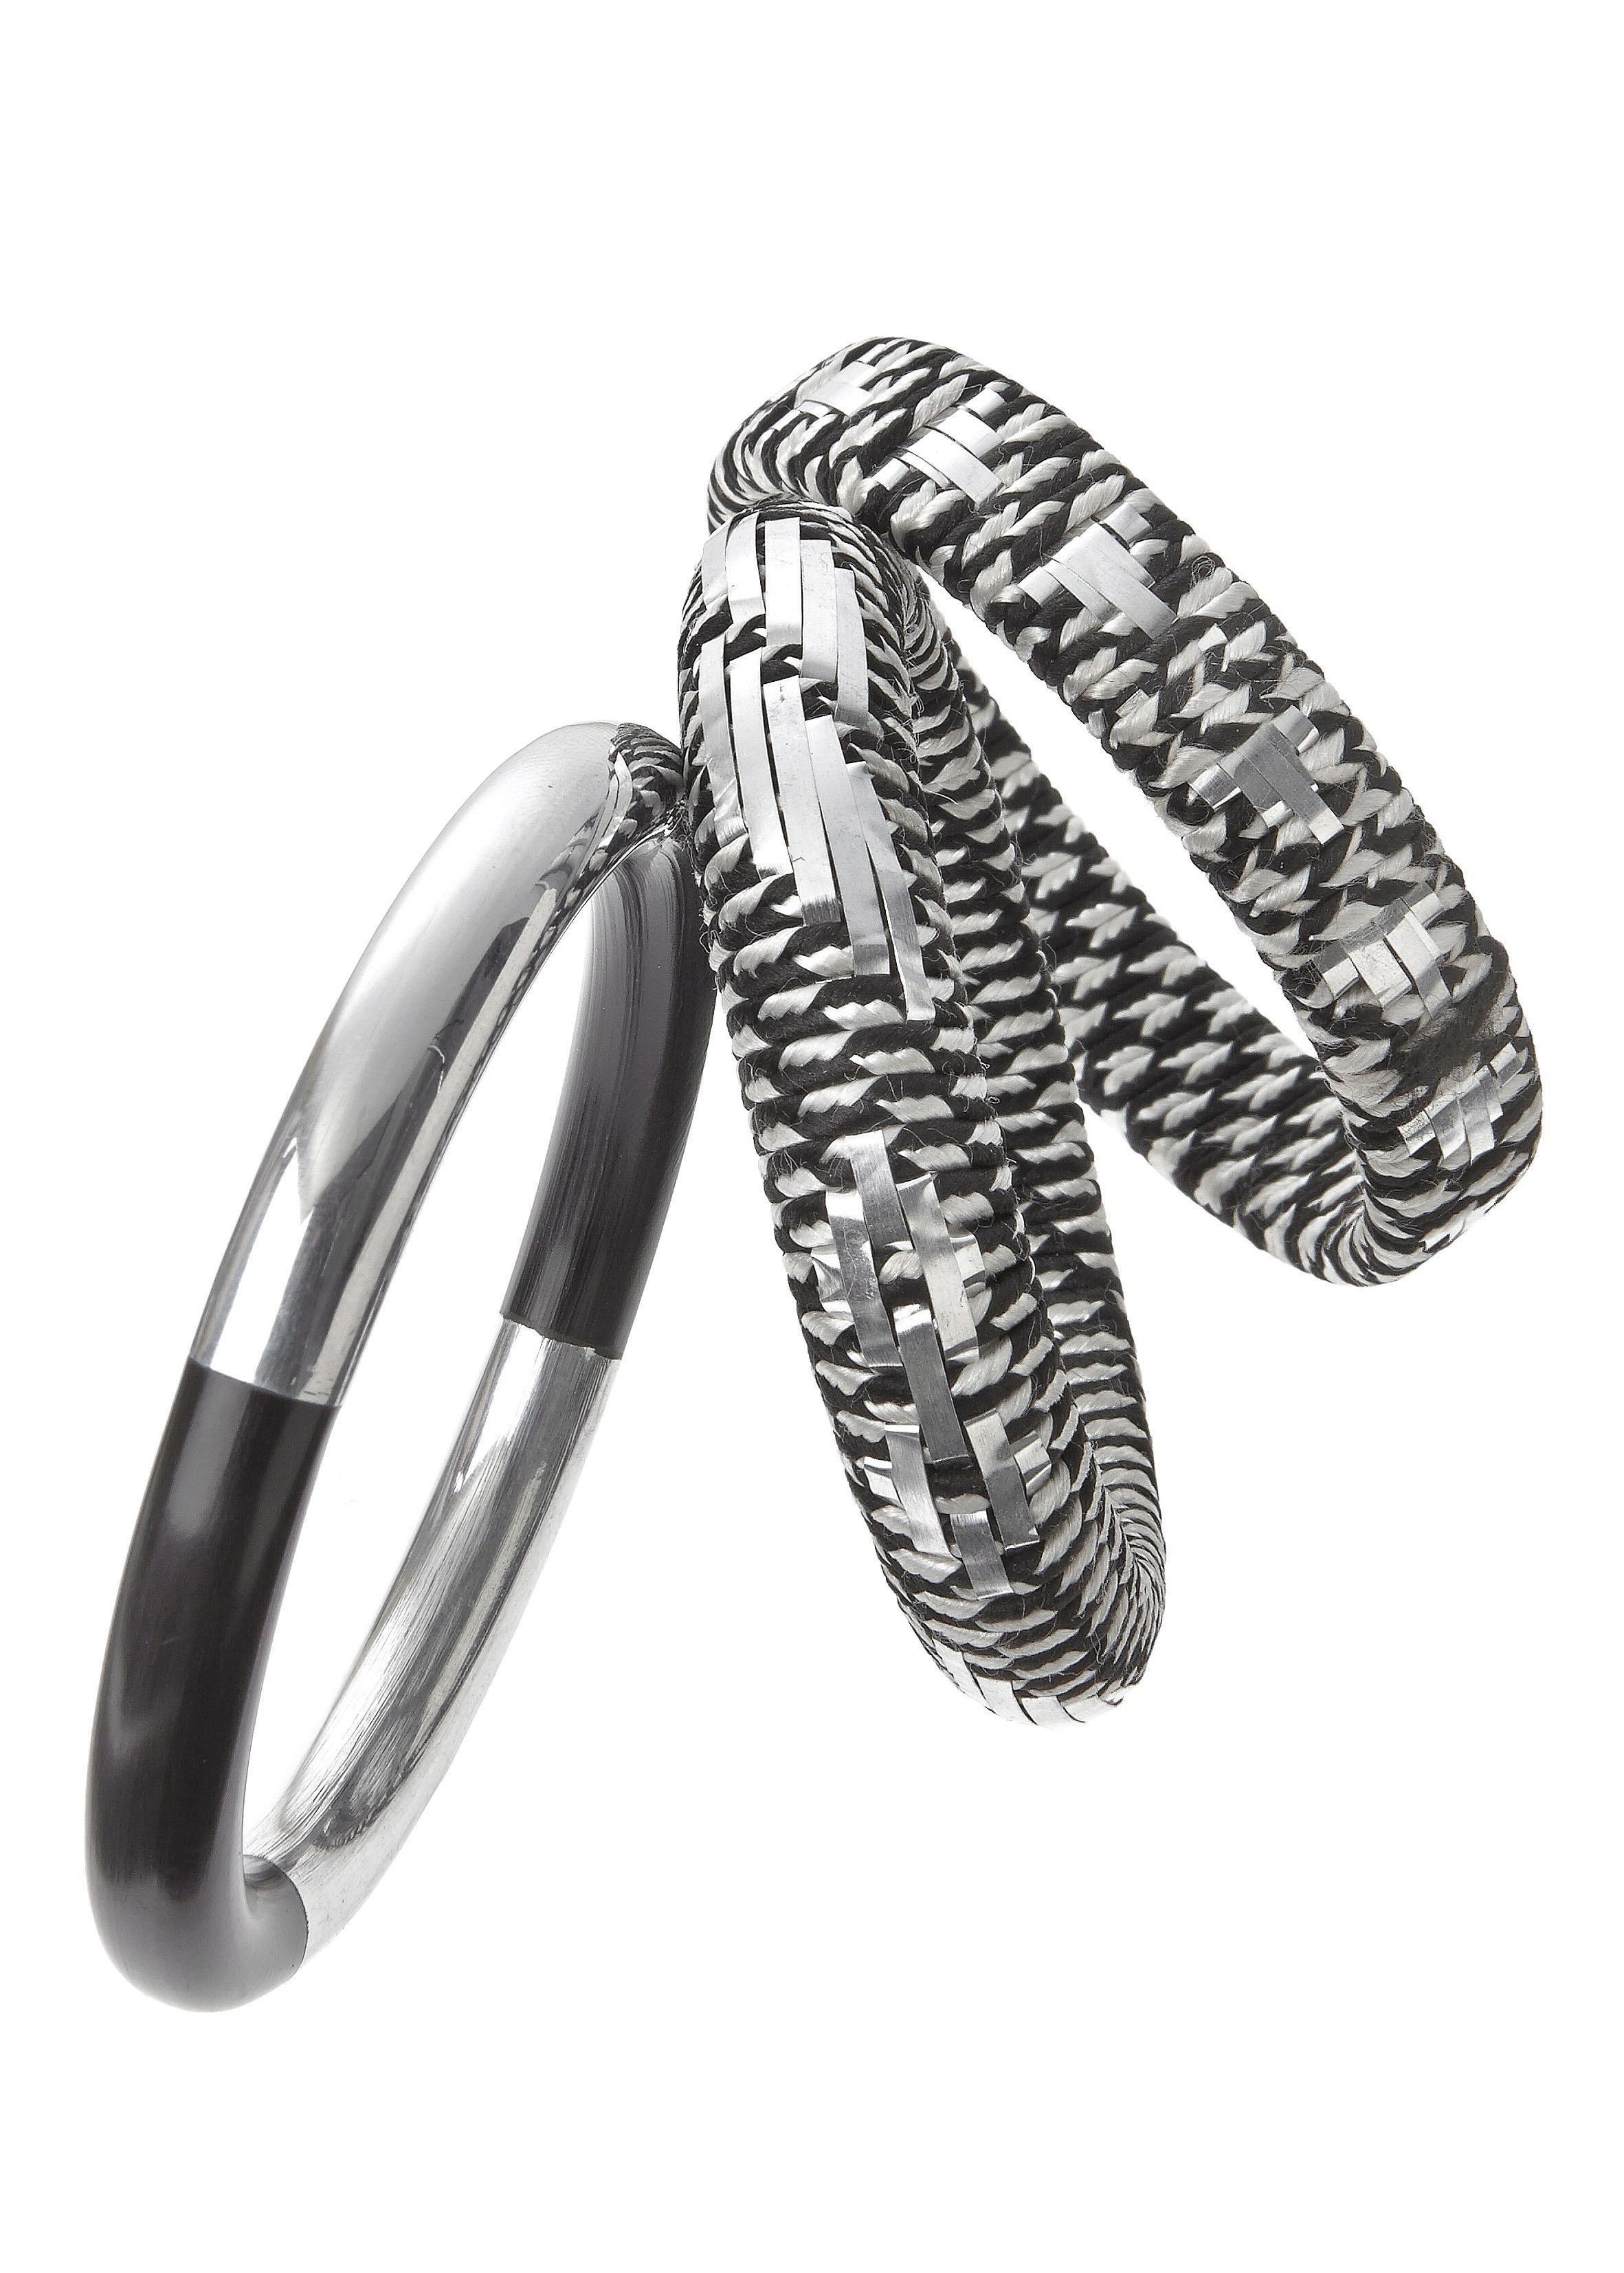 LASCANA armbandenset (3-delig) online kopen op otto.nl